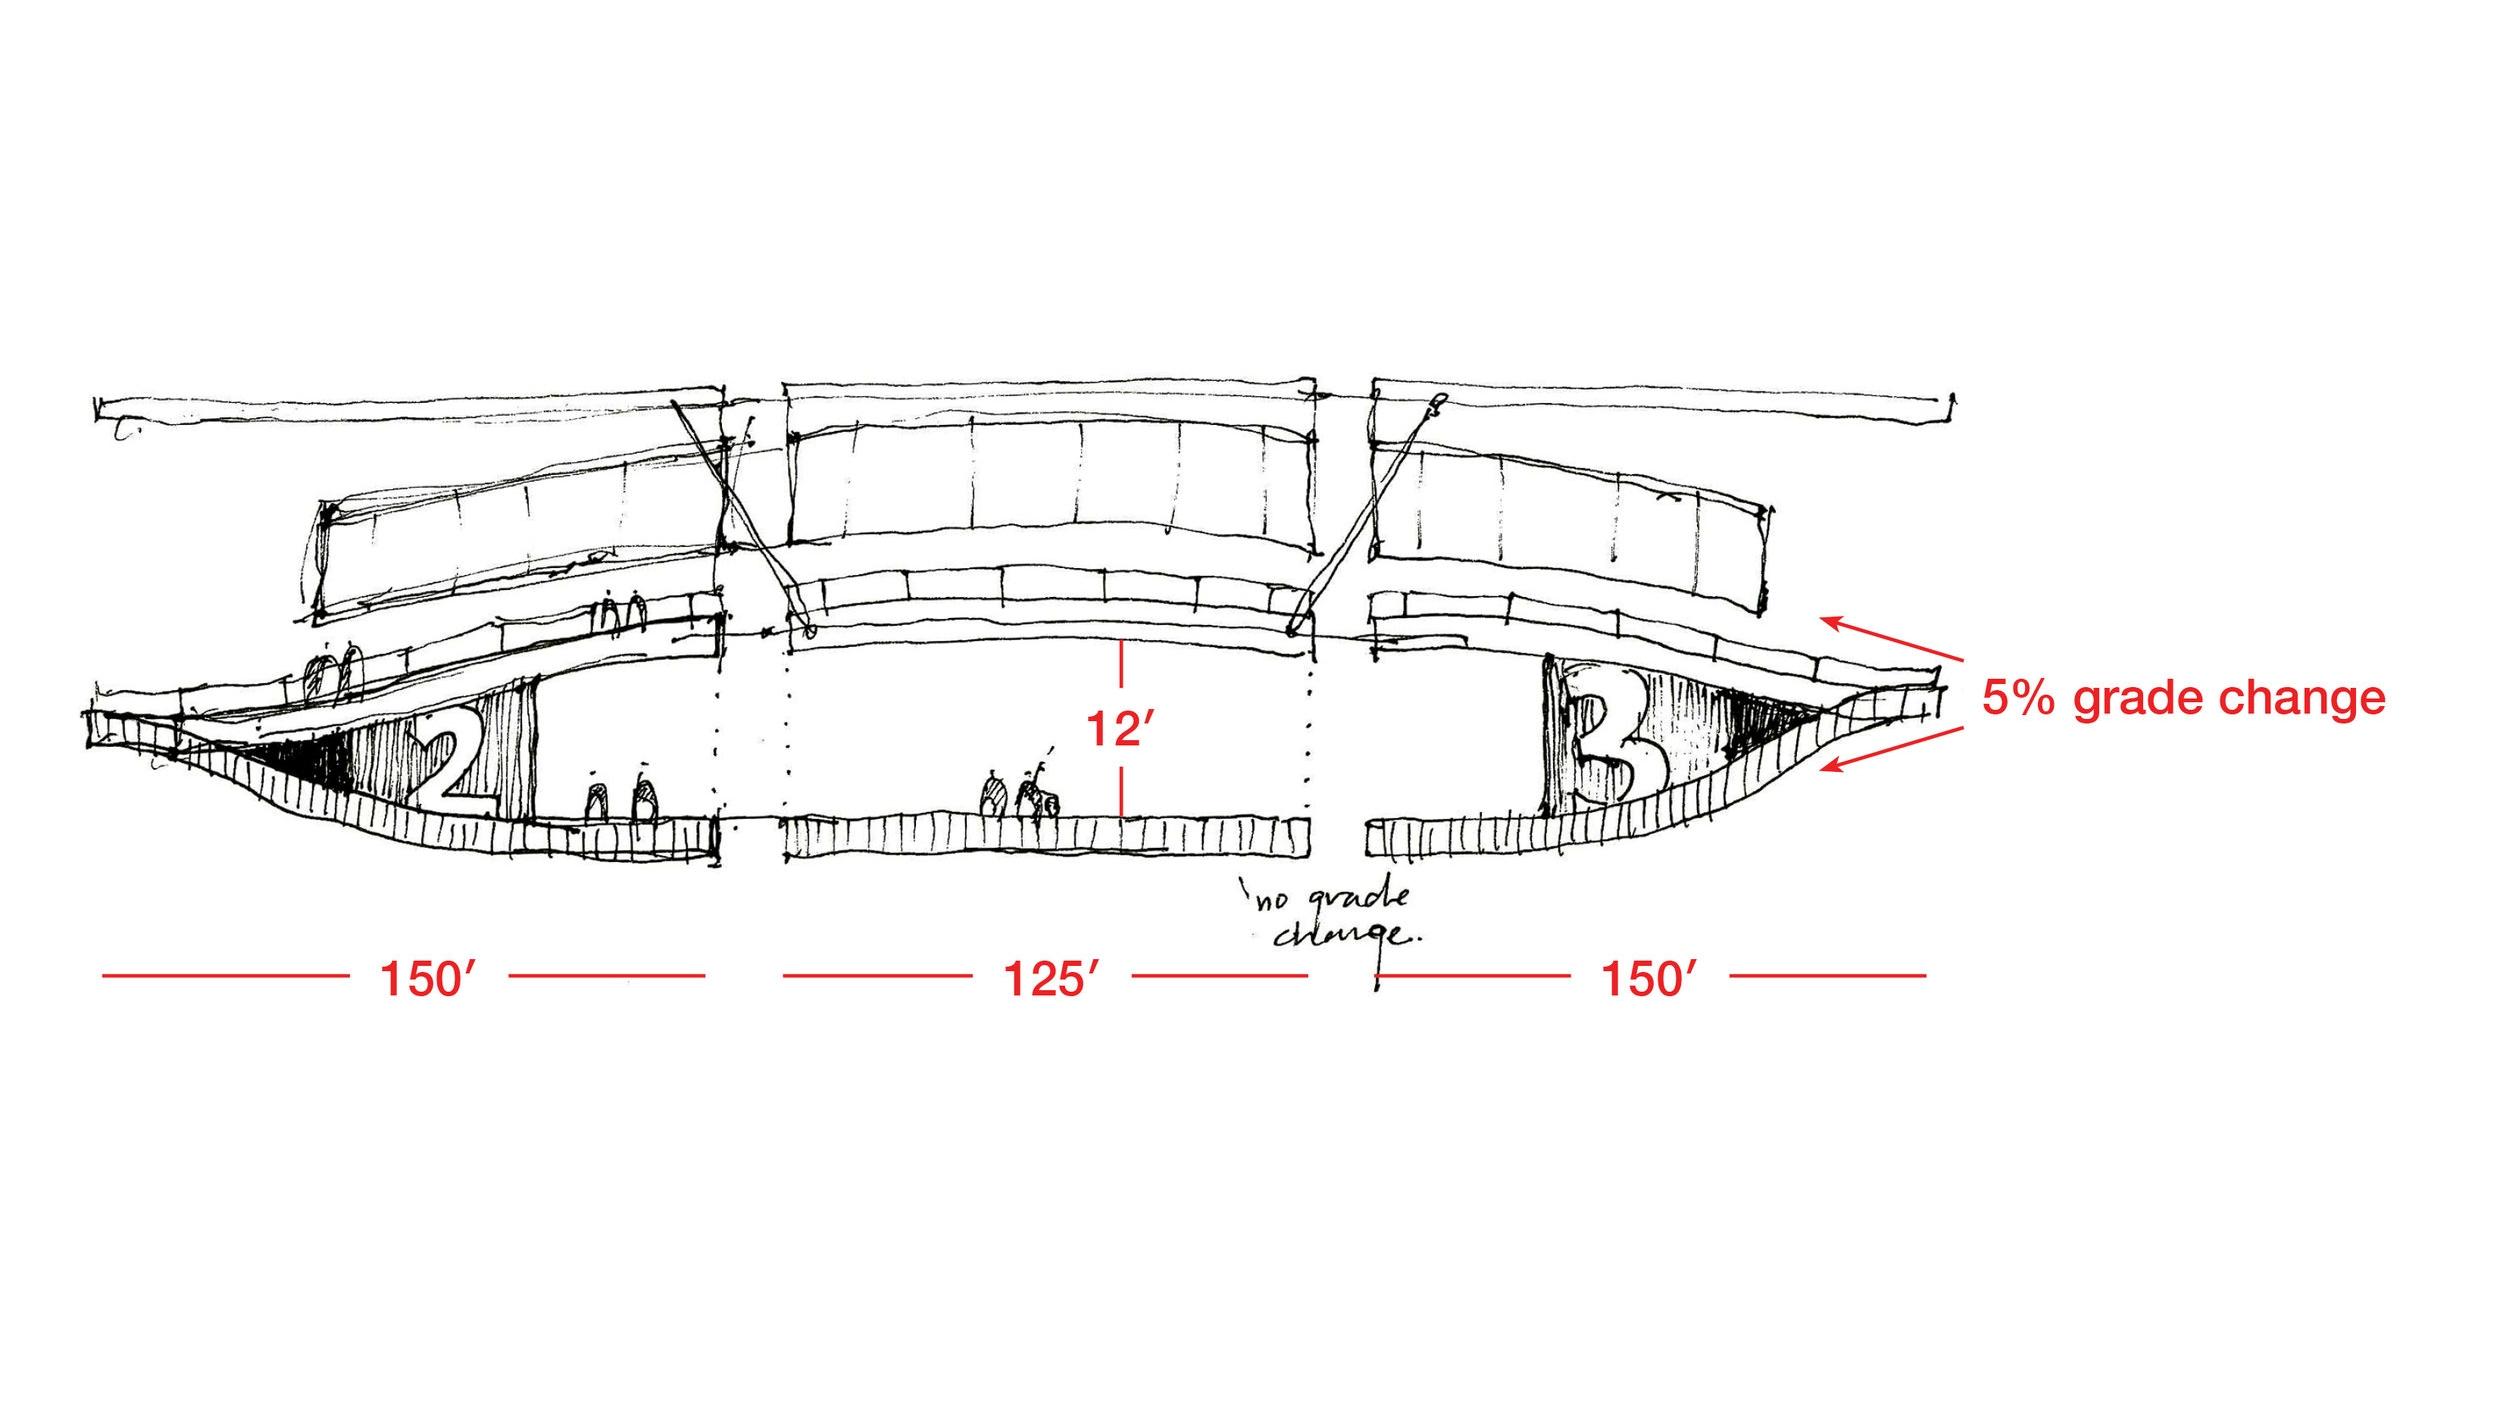 Modular A Departures Diagram.jpg